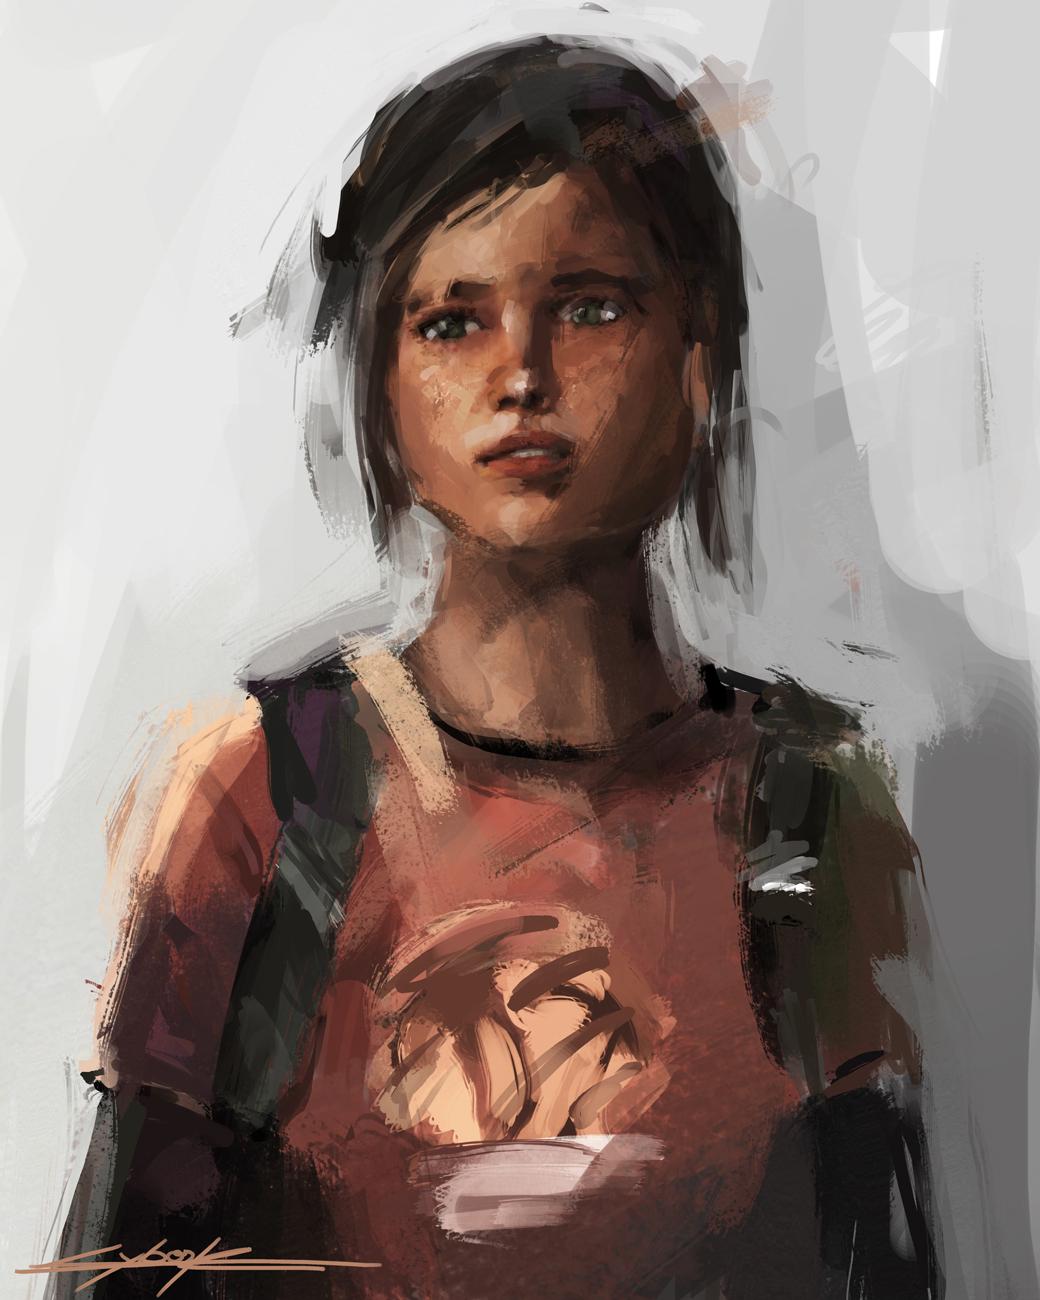 The Last Of Us Ellie By Vitoss On Deviantart